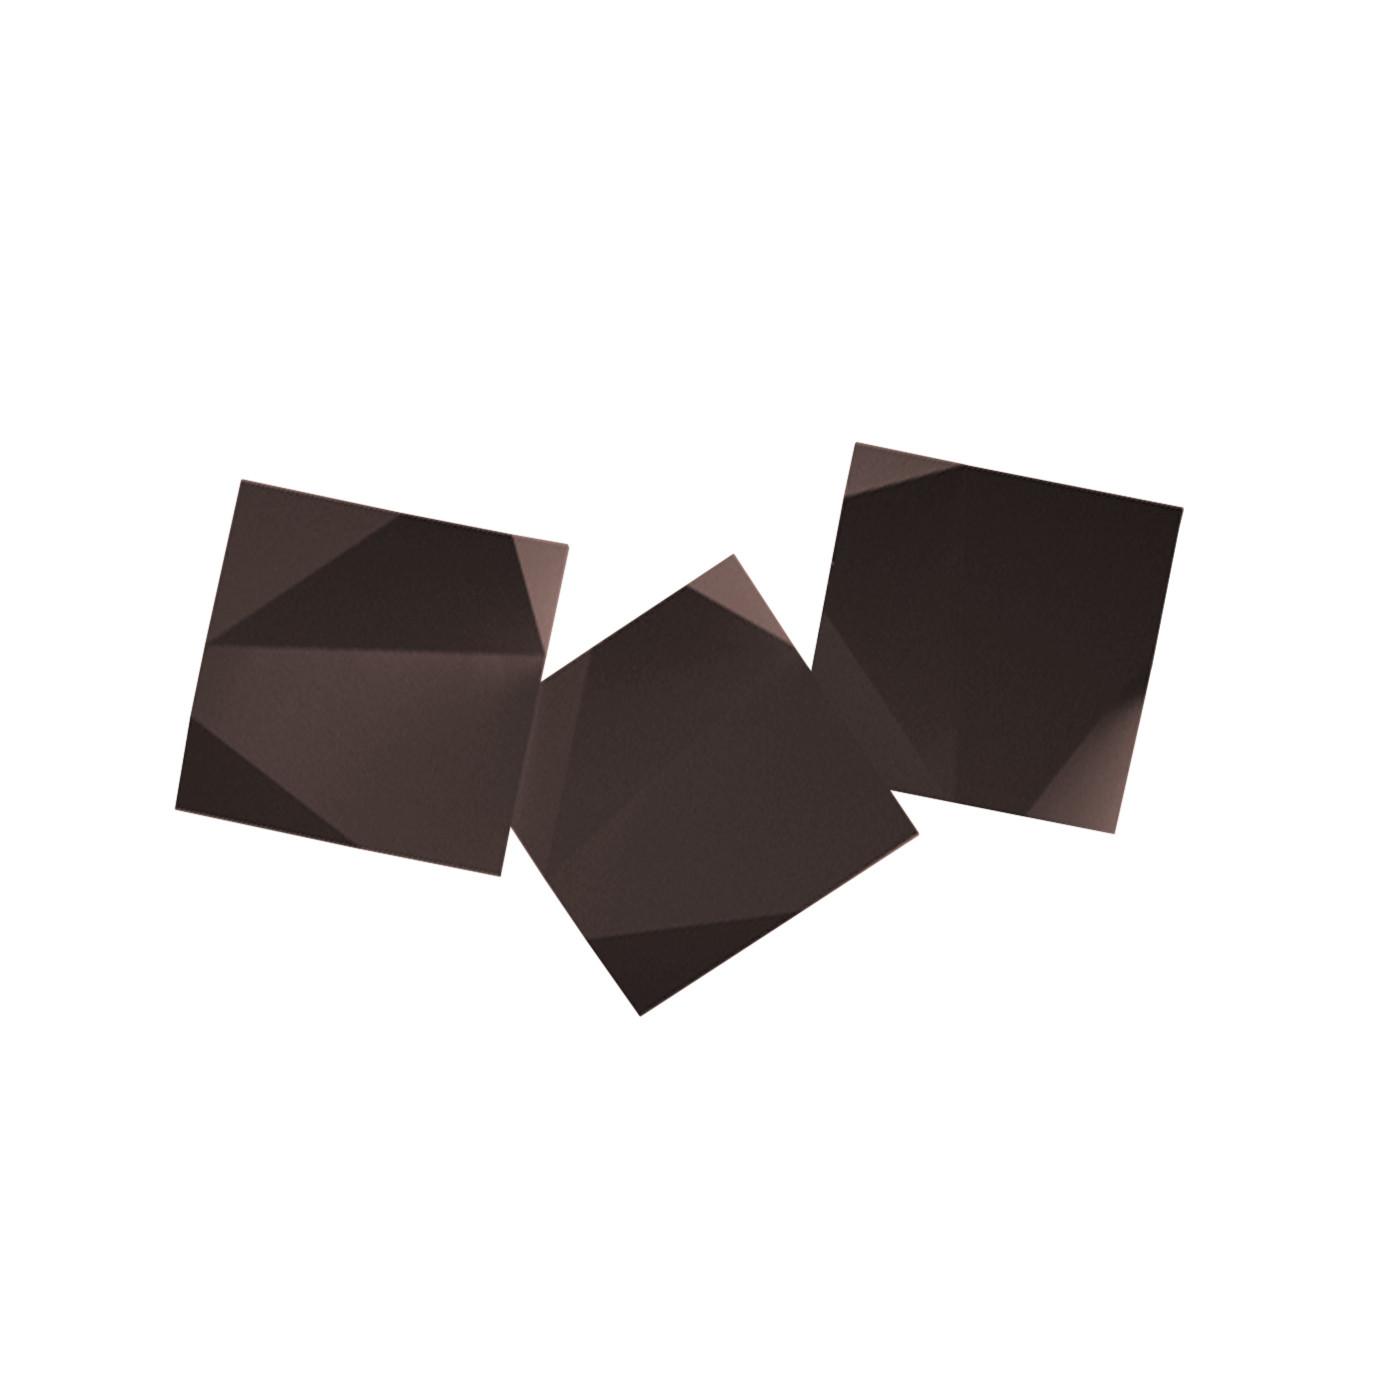 Vibia Origami 4506 Wandleuchte